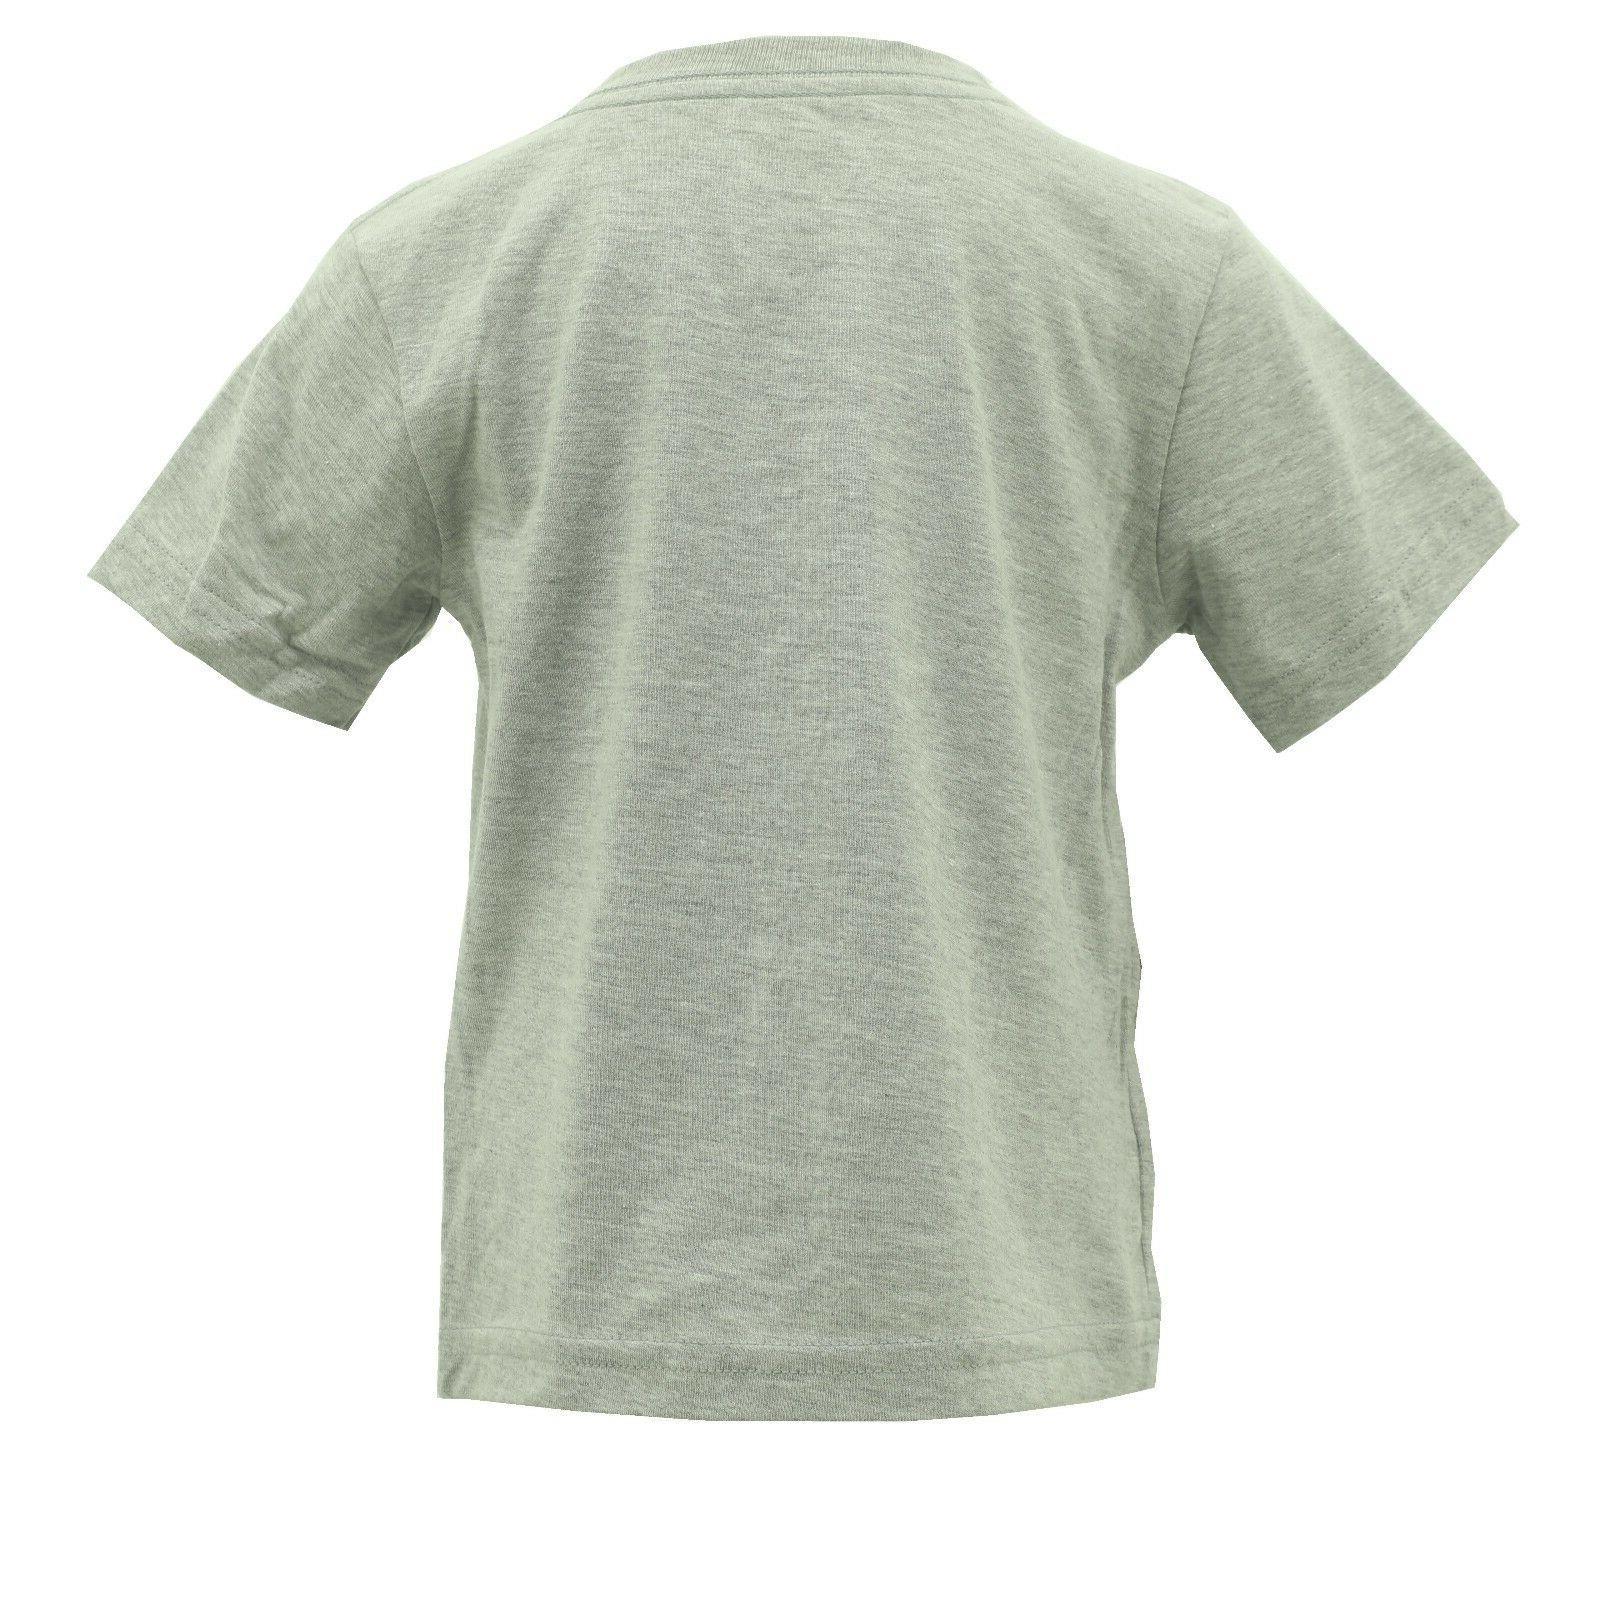 Arizona Apparel infant T-shirt New Tags